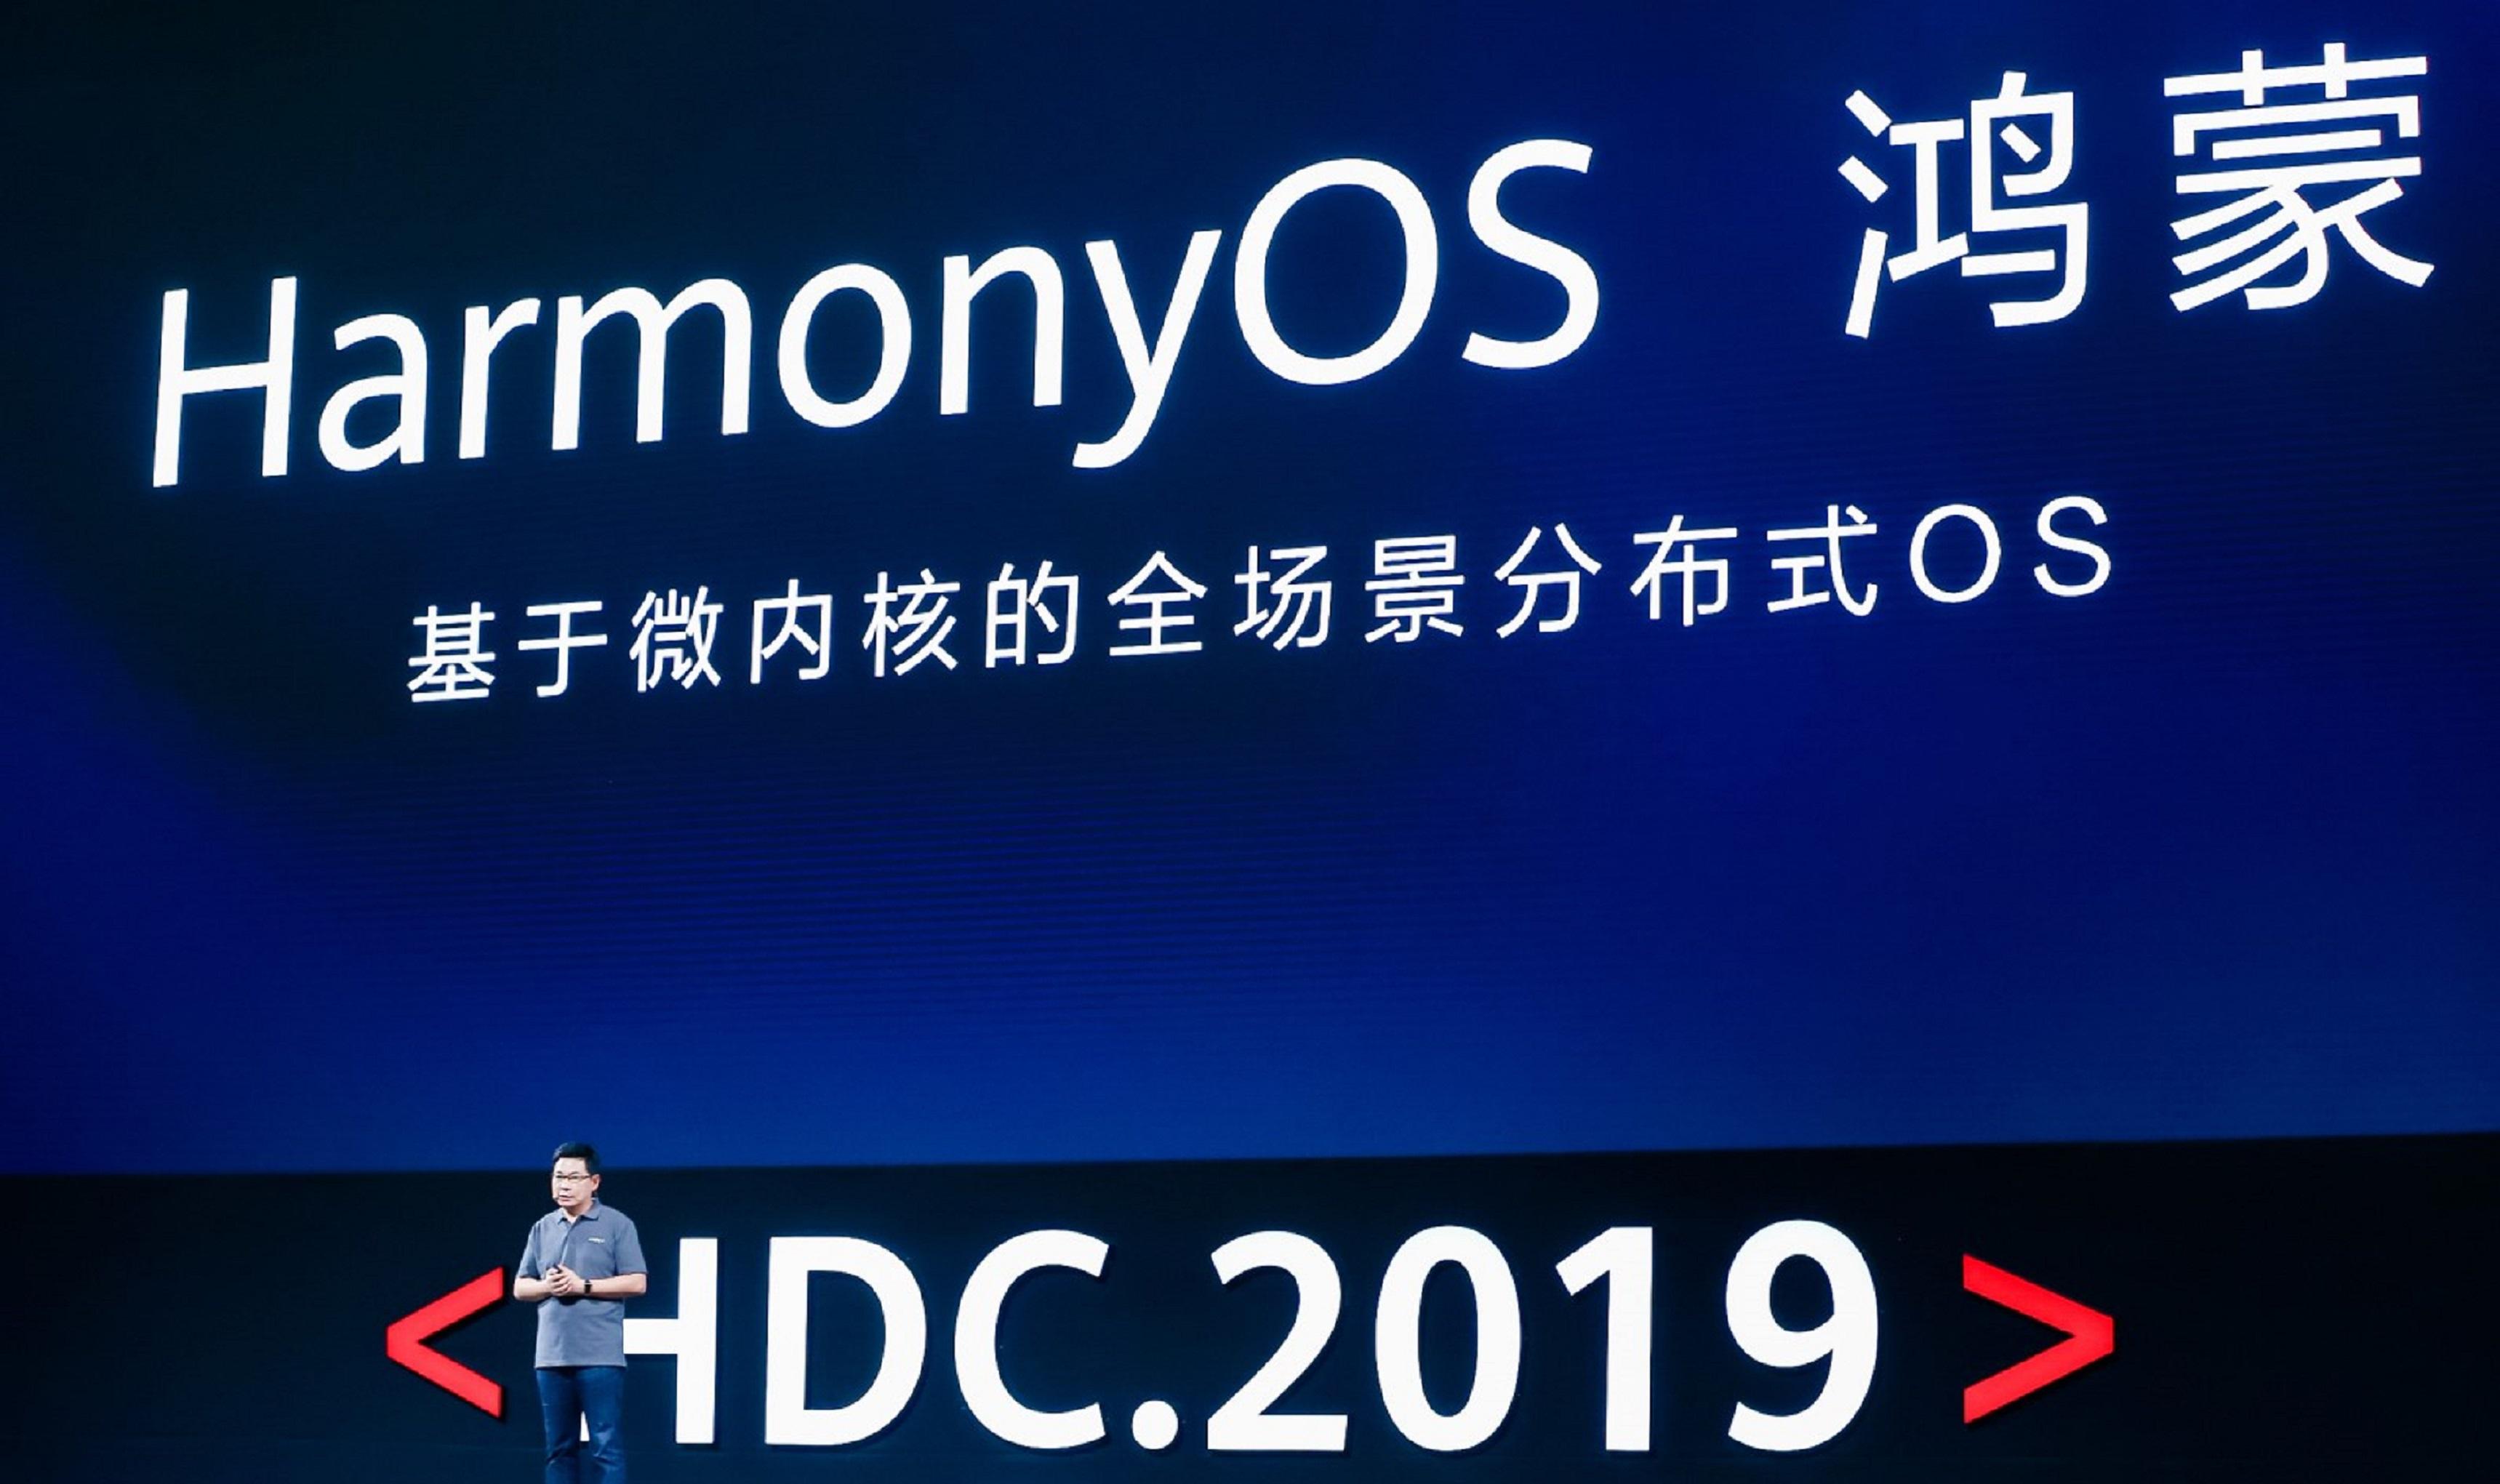 Harmony OS 鴻蒙系統